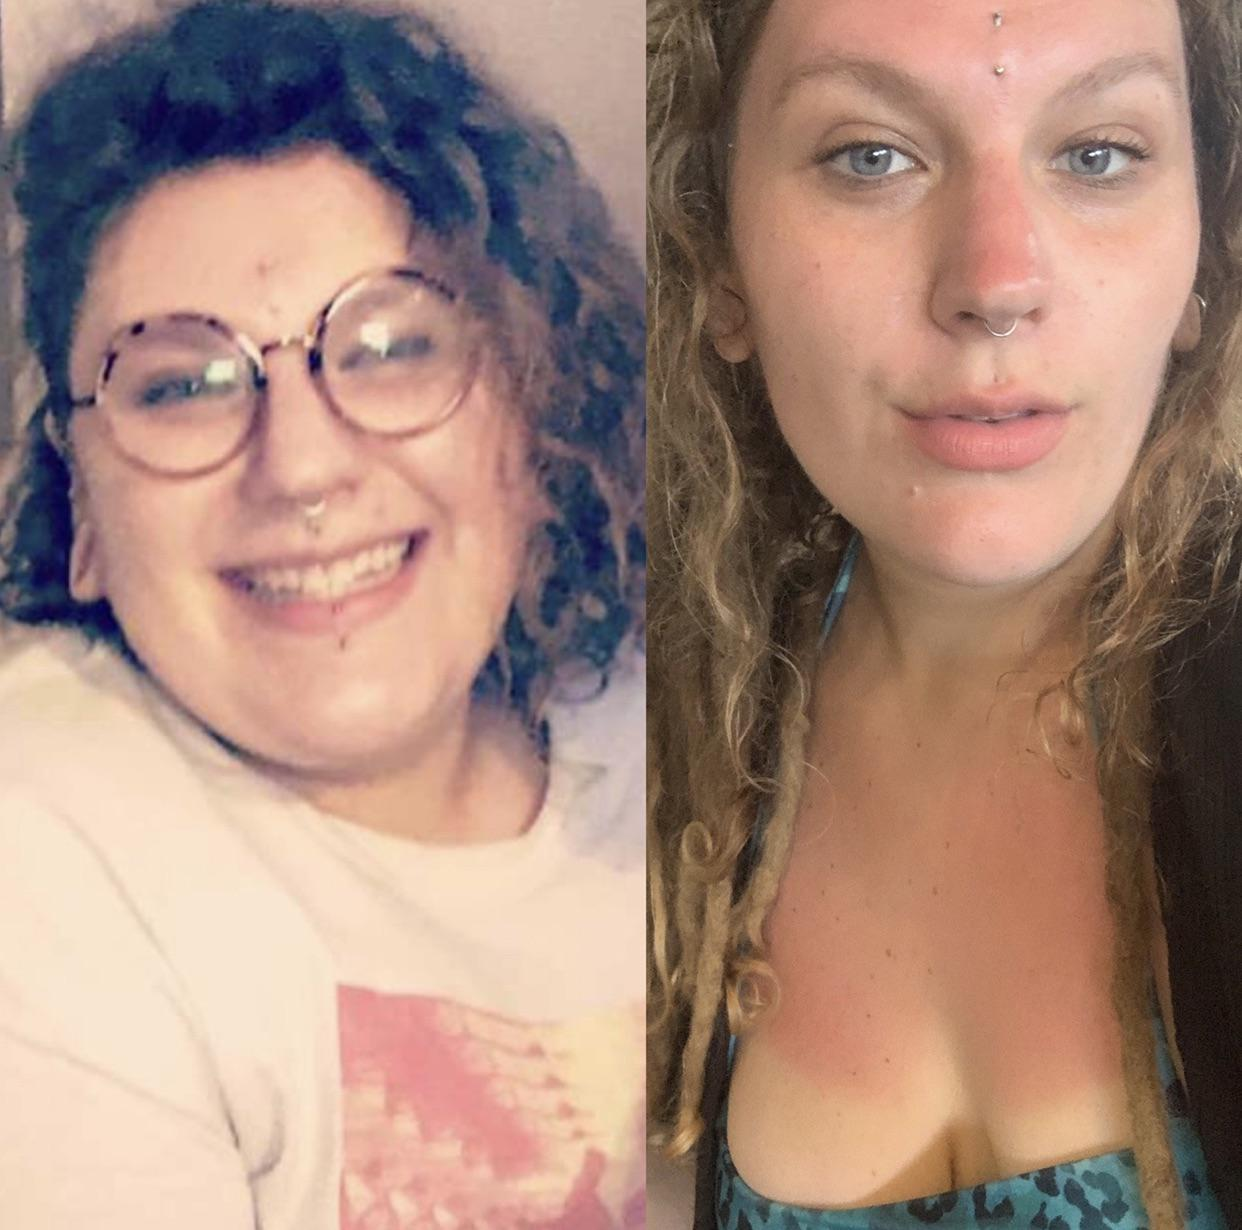 68 lbs Fat Loss 5 feet 10 Female 306 lbs to 238 lbs